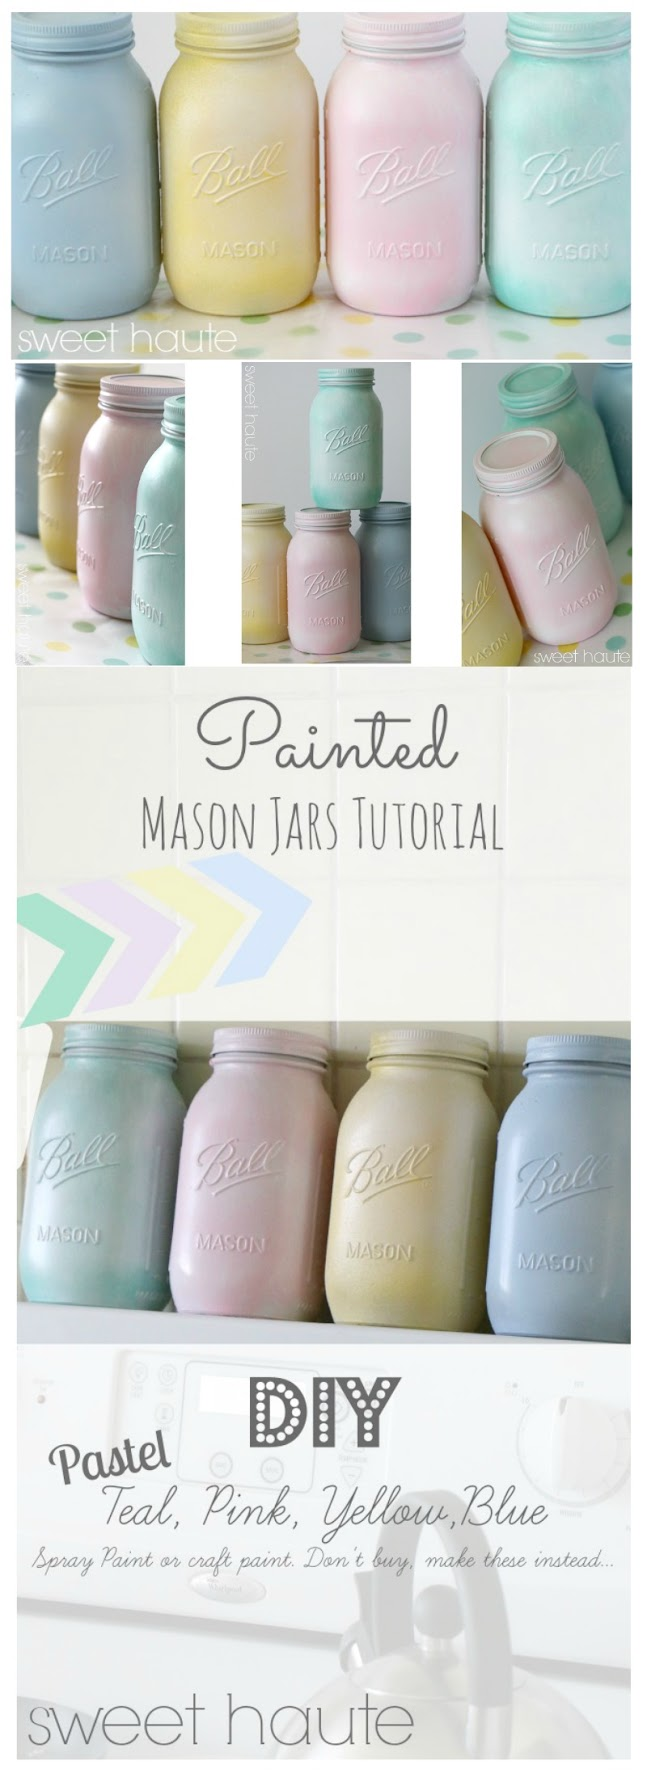 http://sweethaute.blogspot.com/2015/04/spring-mason-jars-tutorial.html